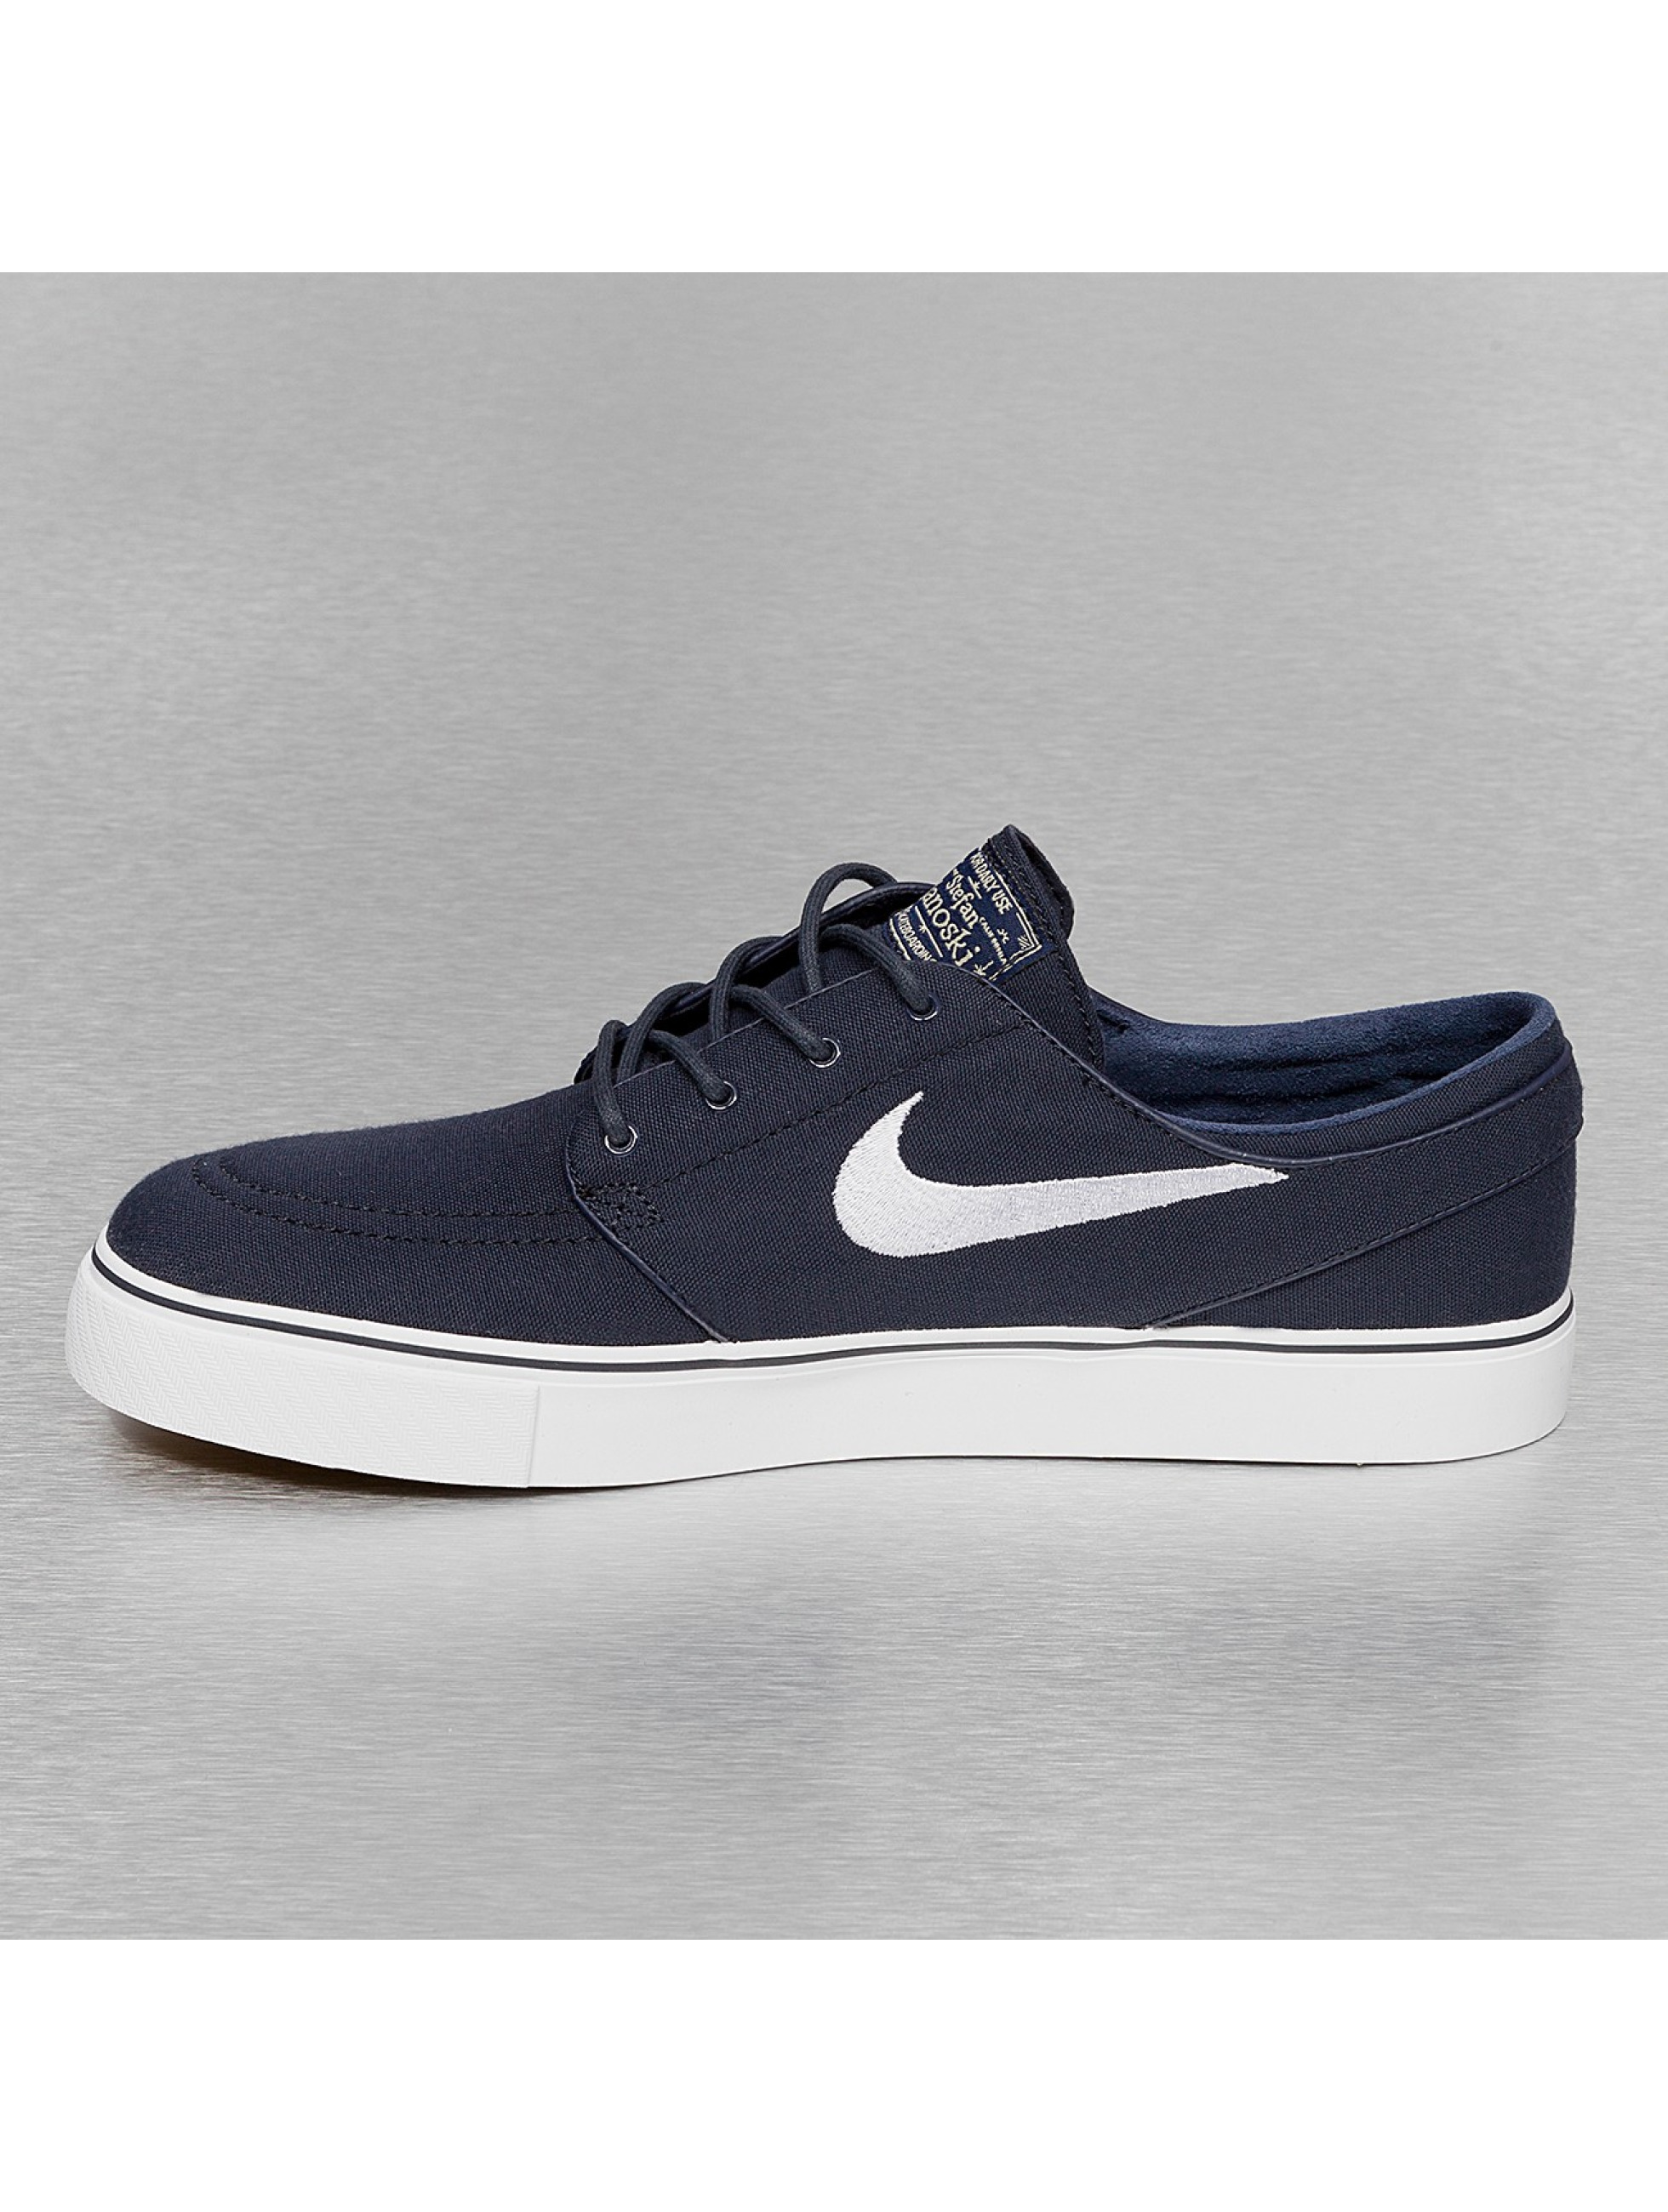 Nike Tas Dames : Nike schoenen blauw dames gympen coco early